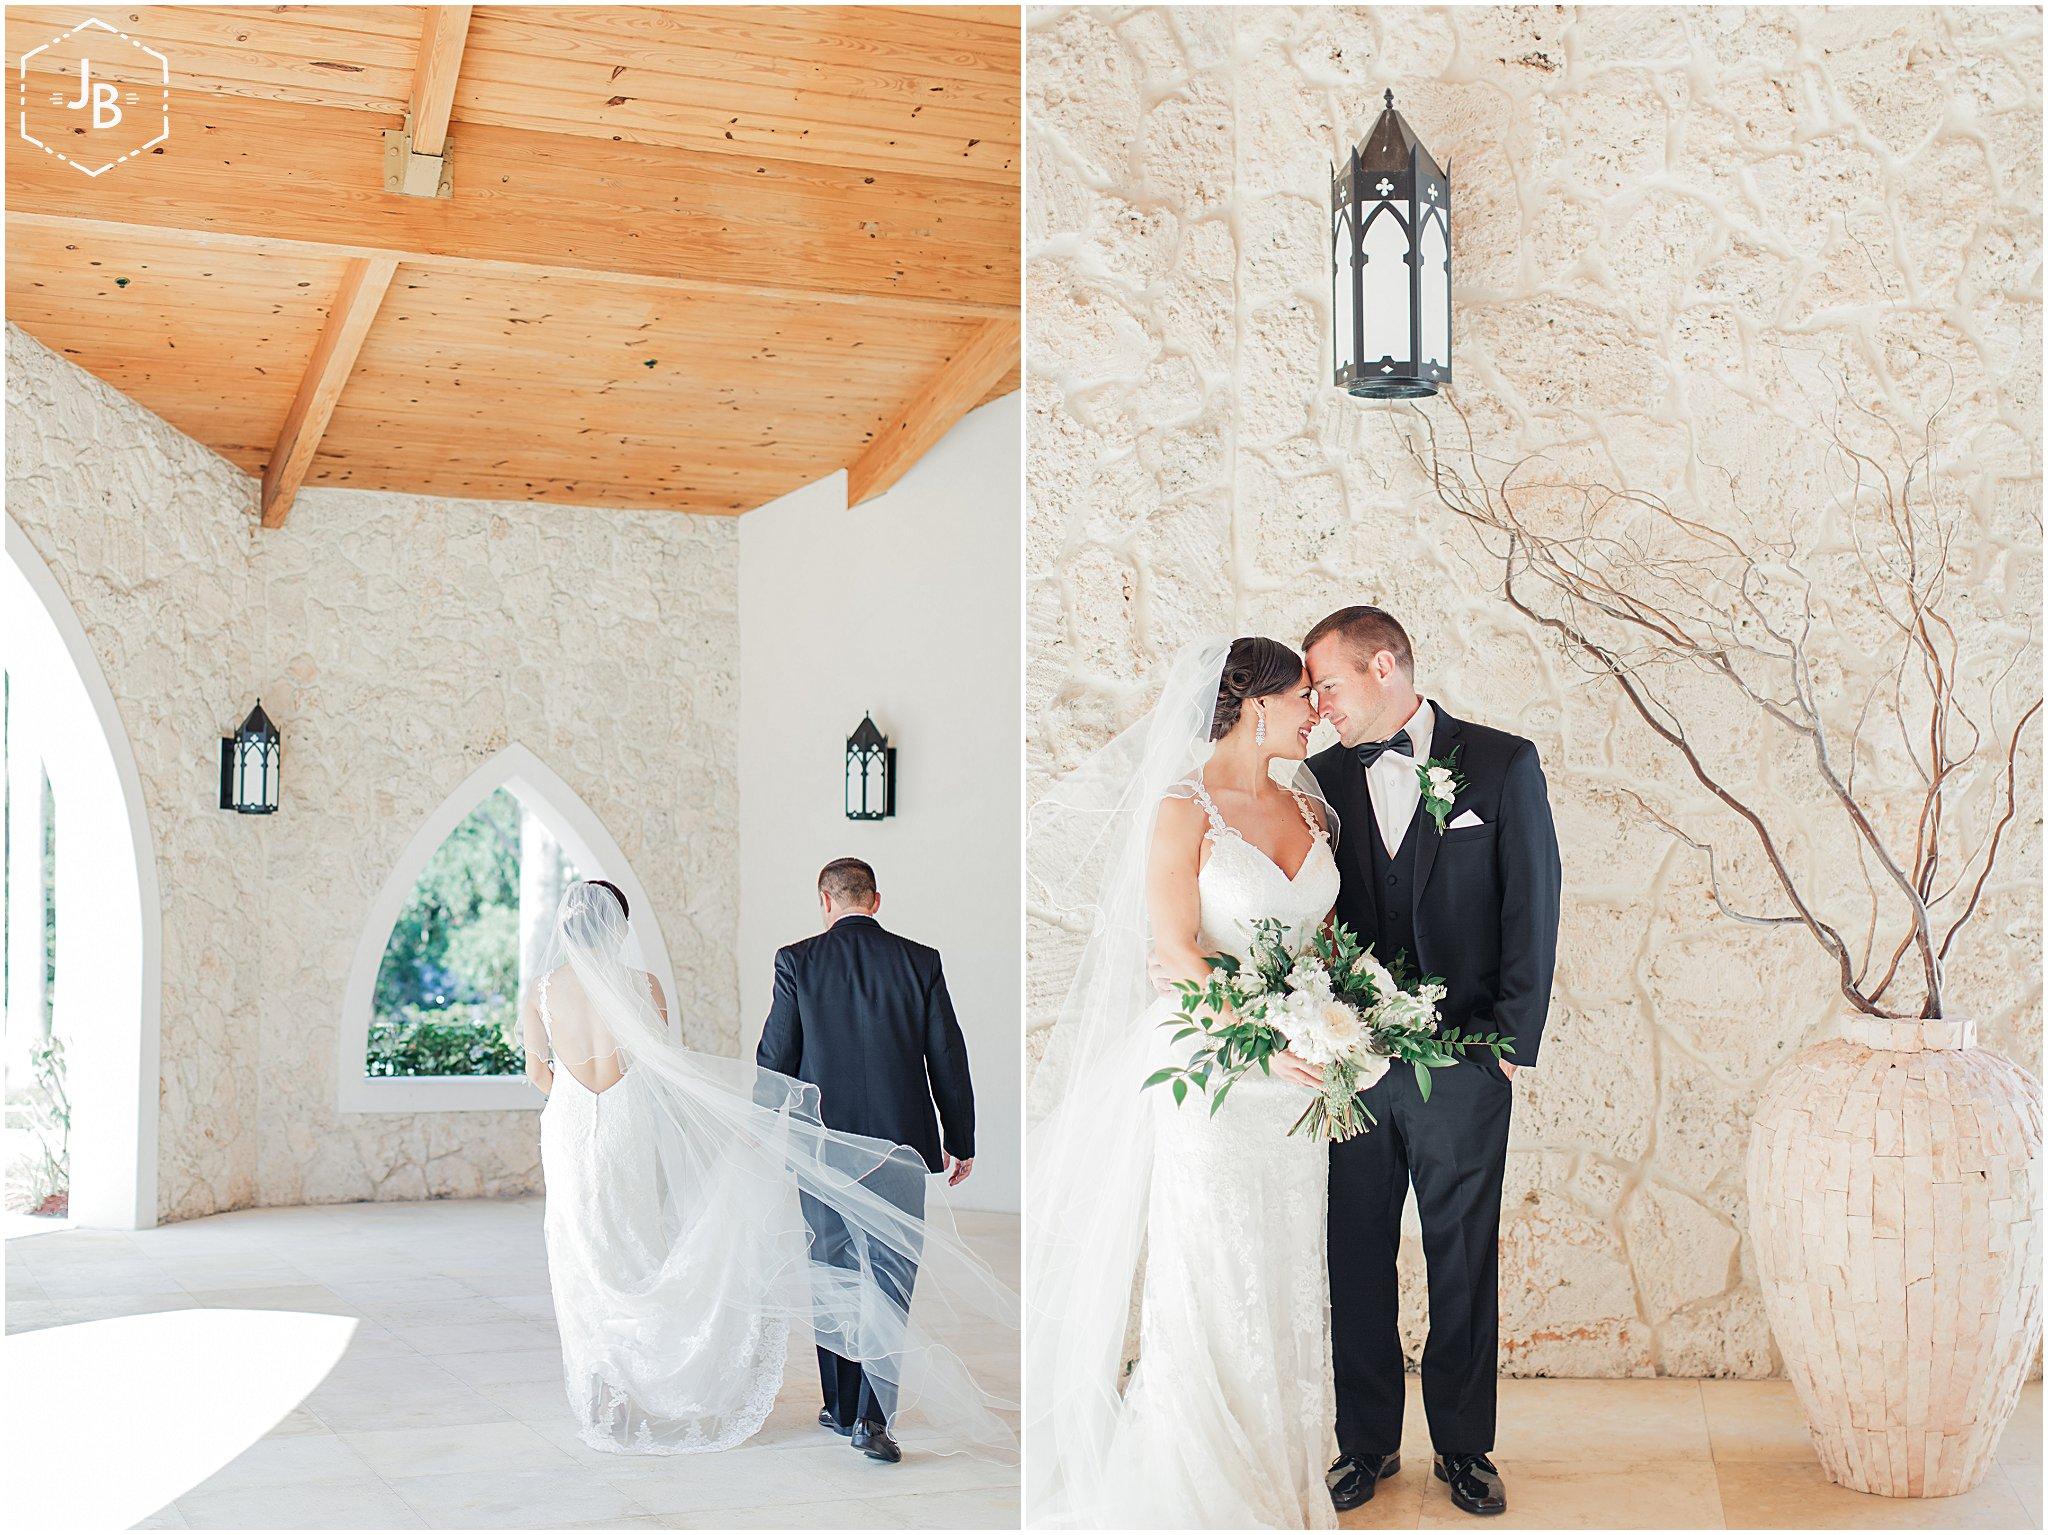 WeddingandEngagementFloridaPhotographer_0216.jpg